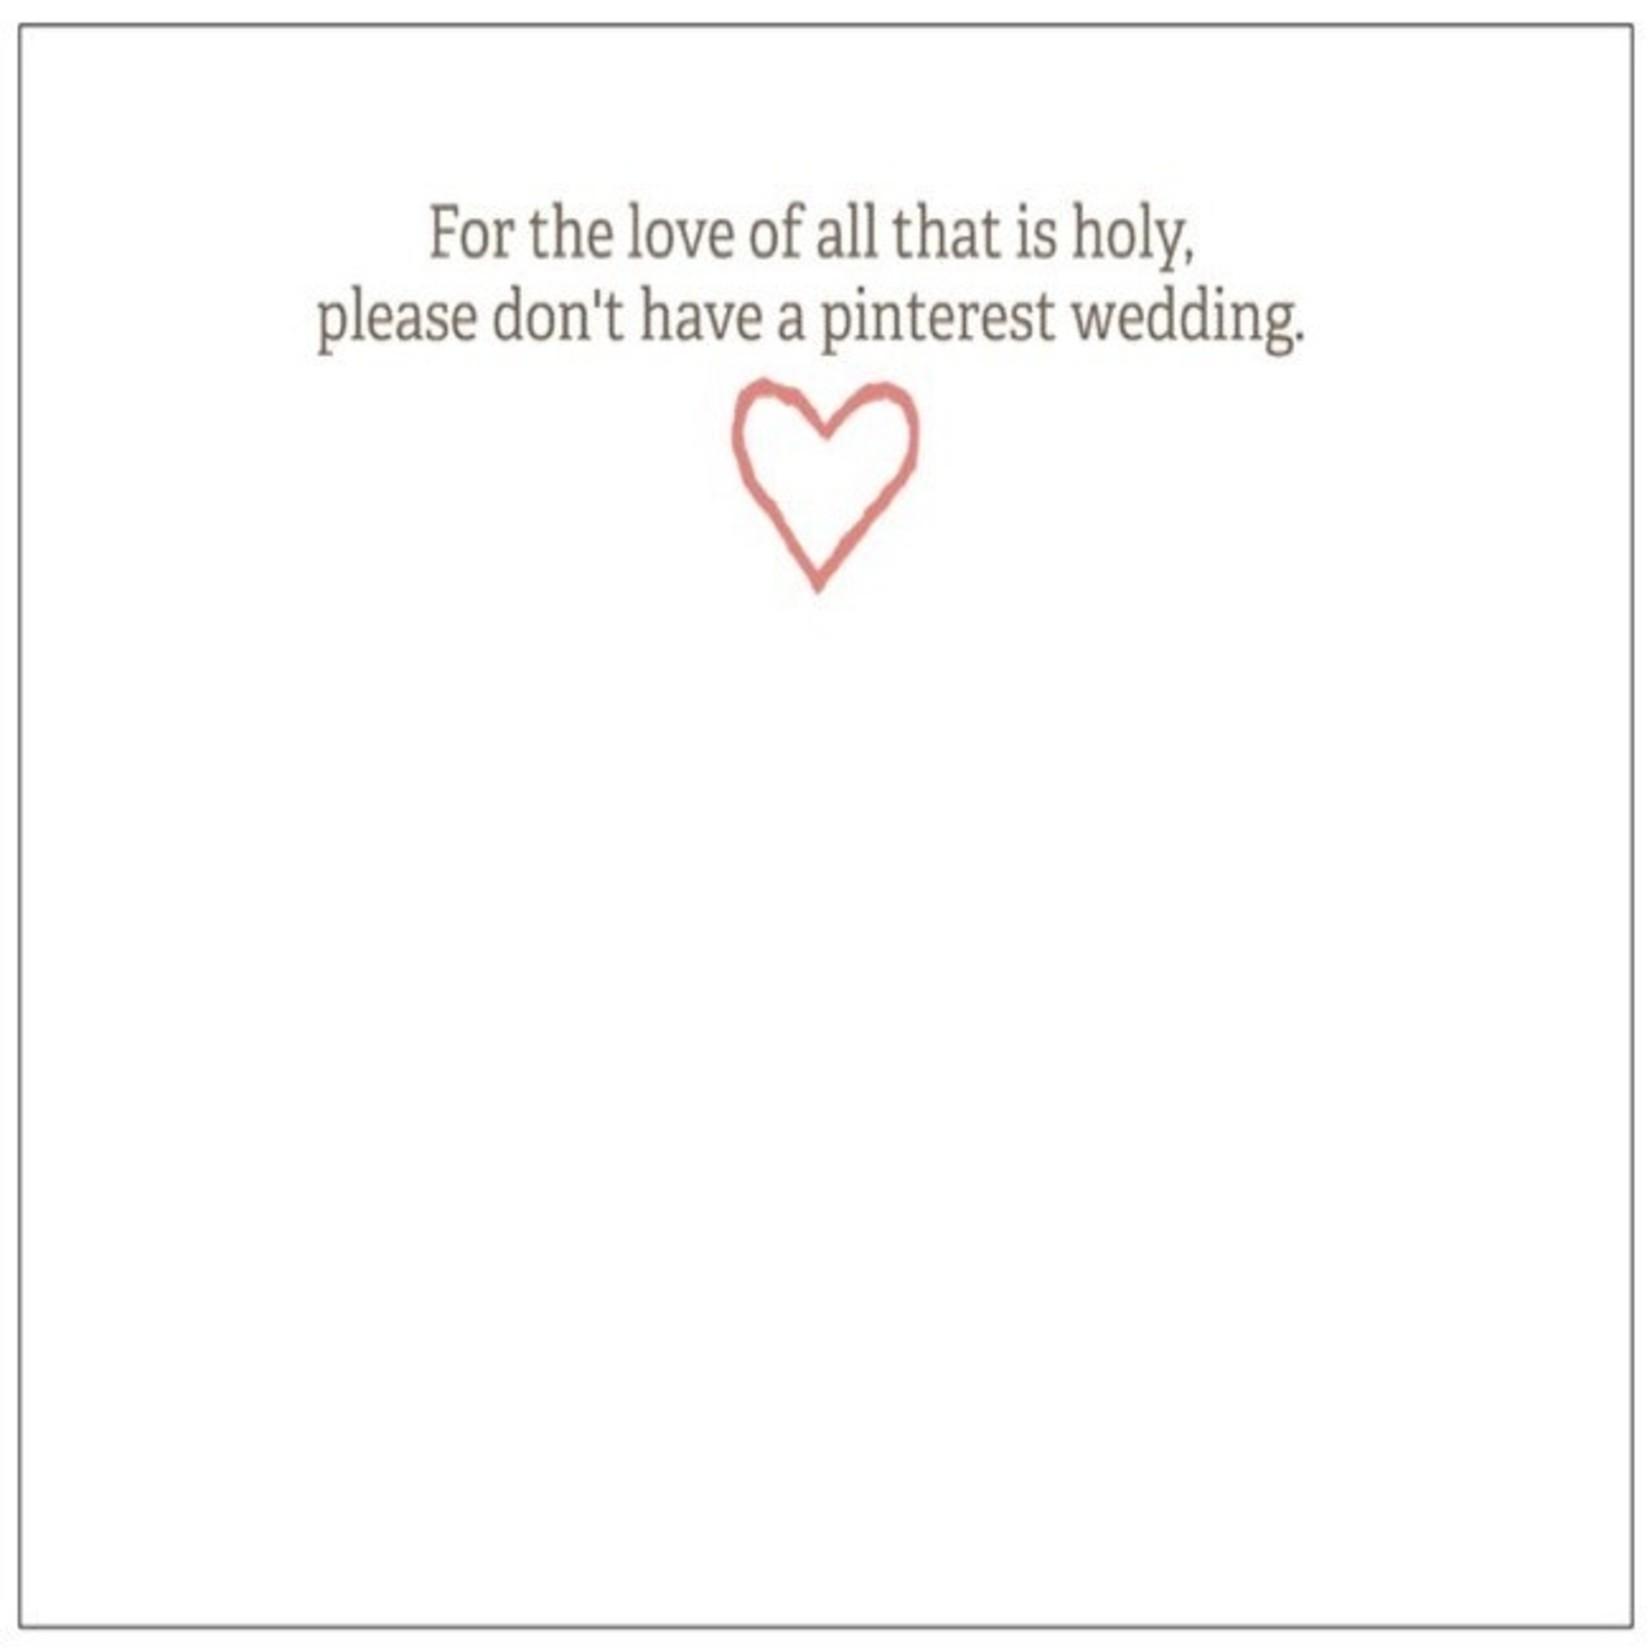 Bad Annie's Card #004 - Congrats On Engagement, Pinterest Wedding